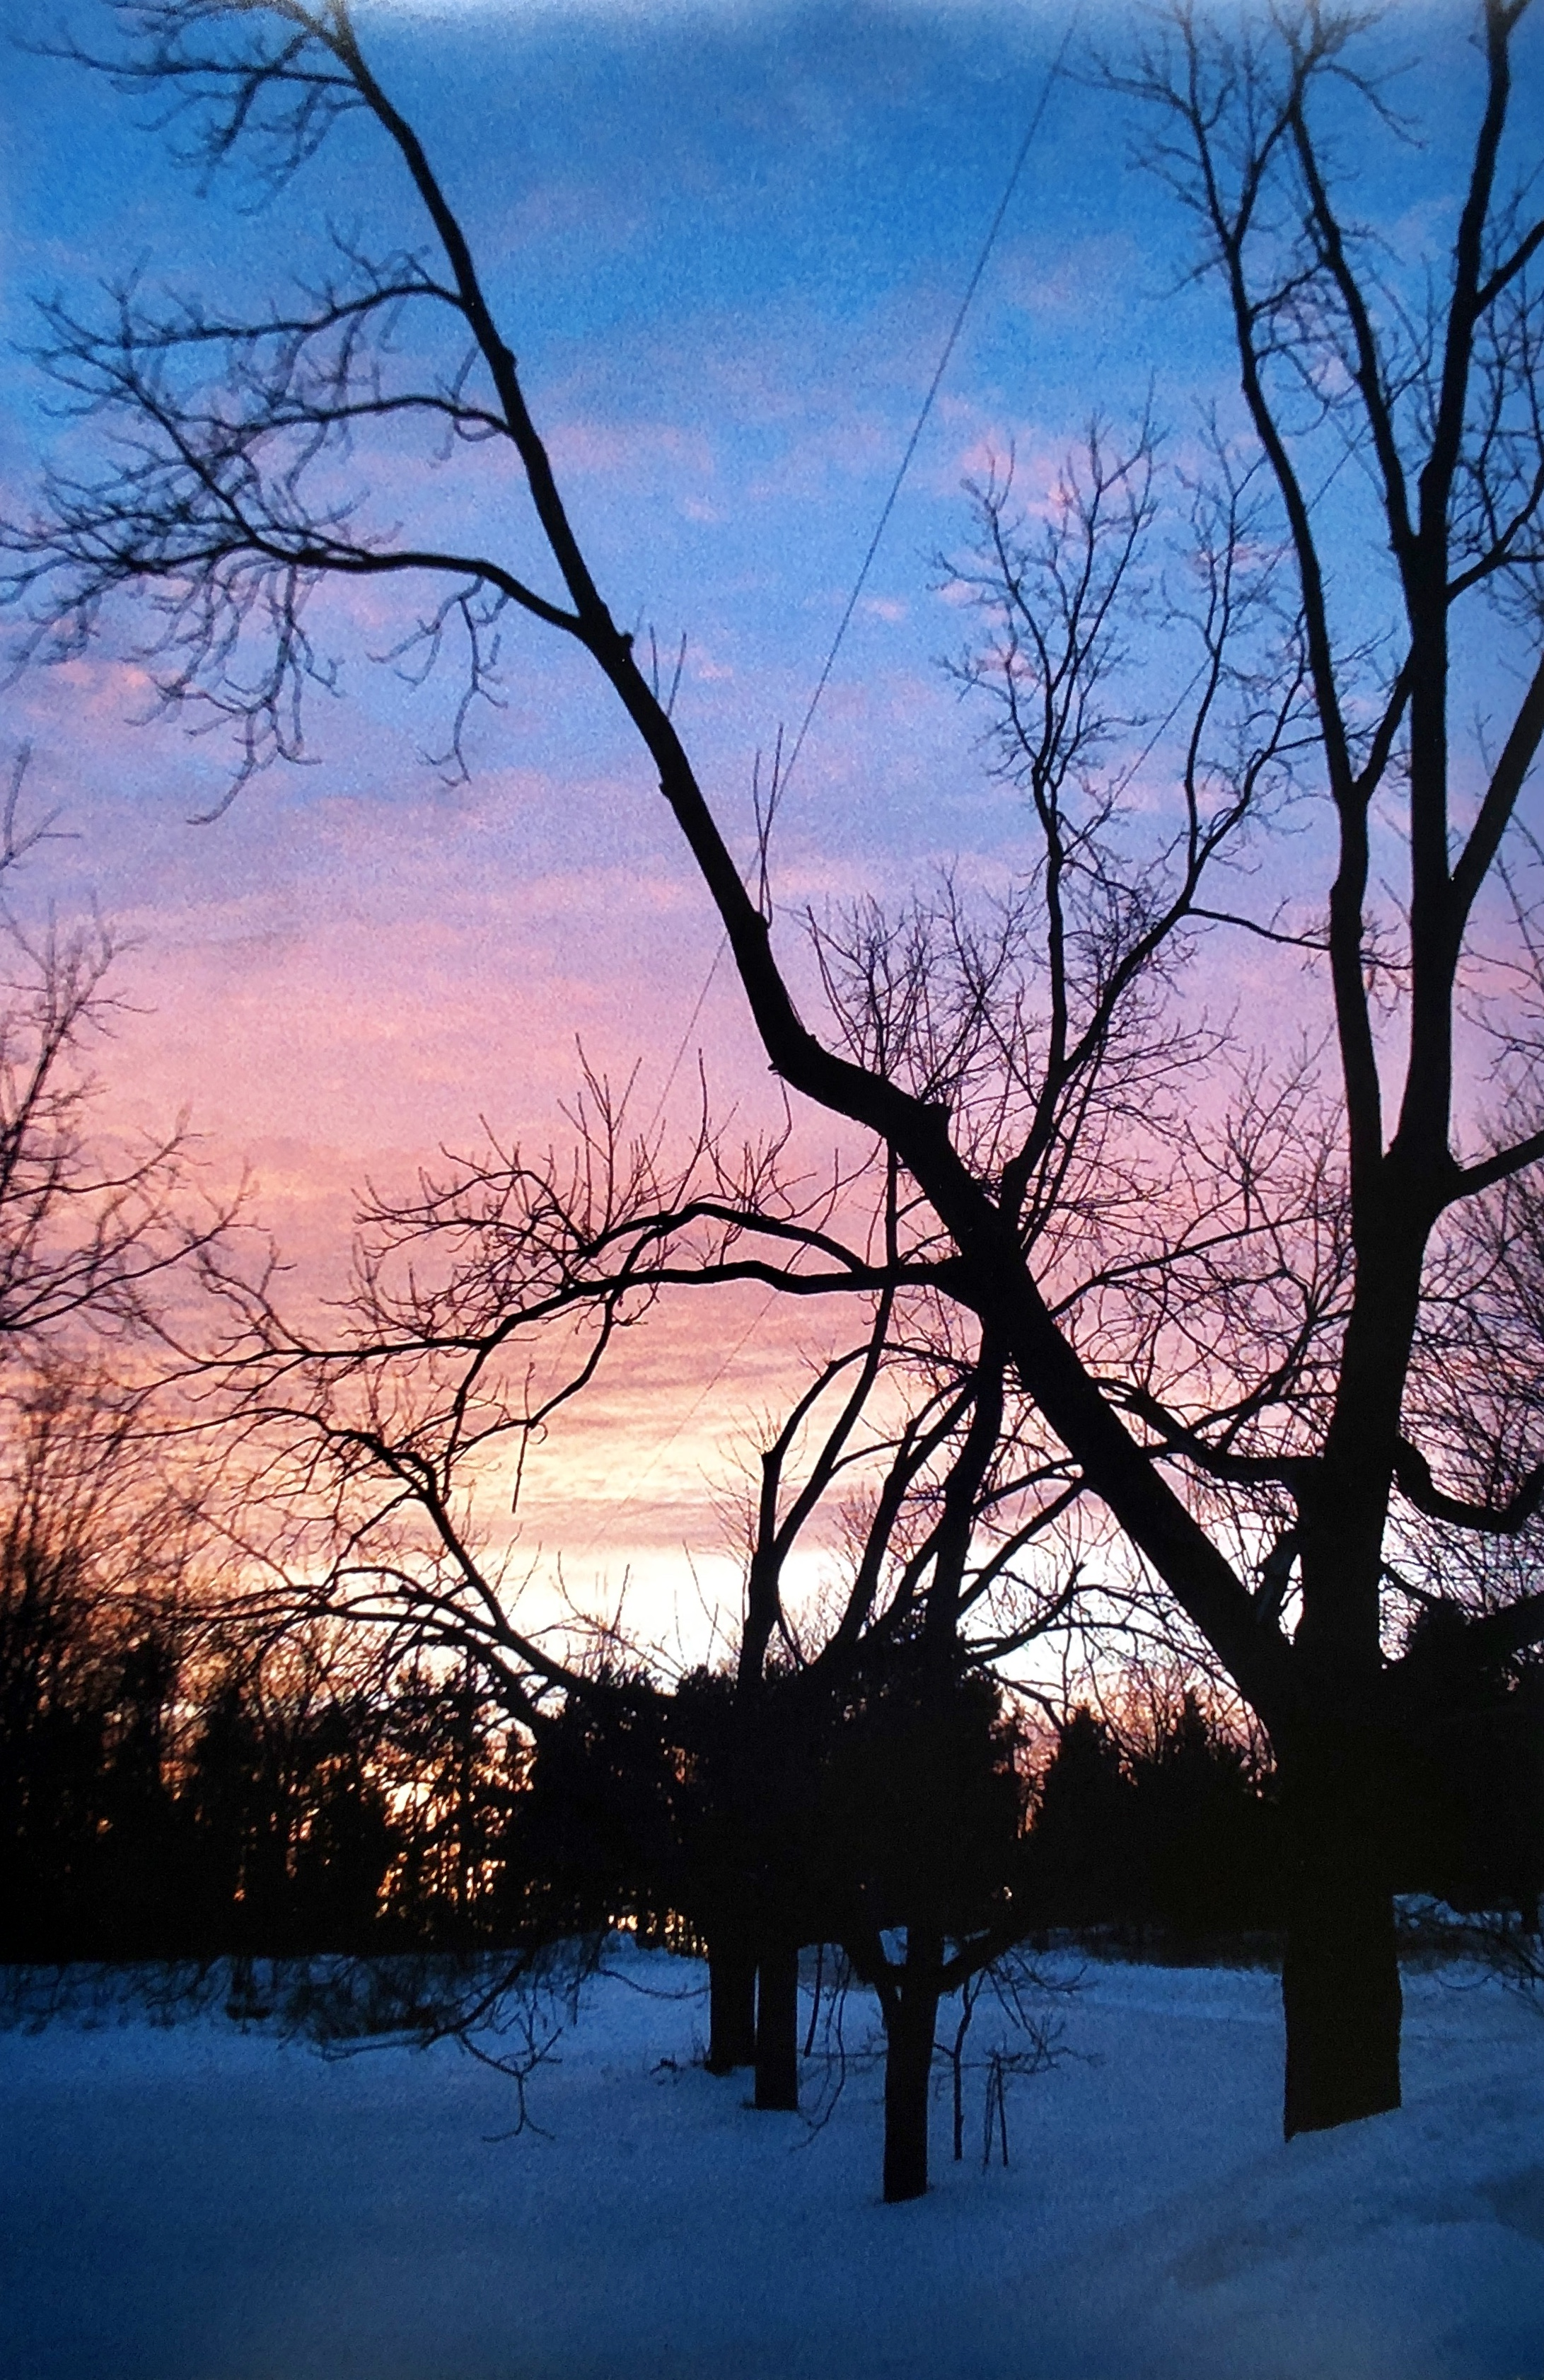 Calm Winter Sunset